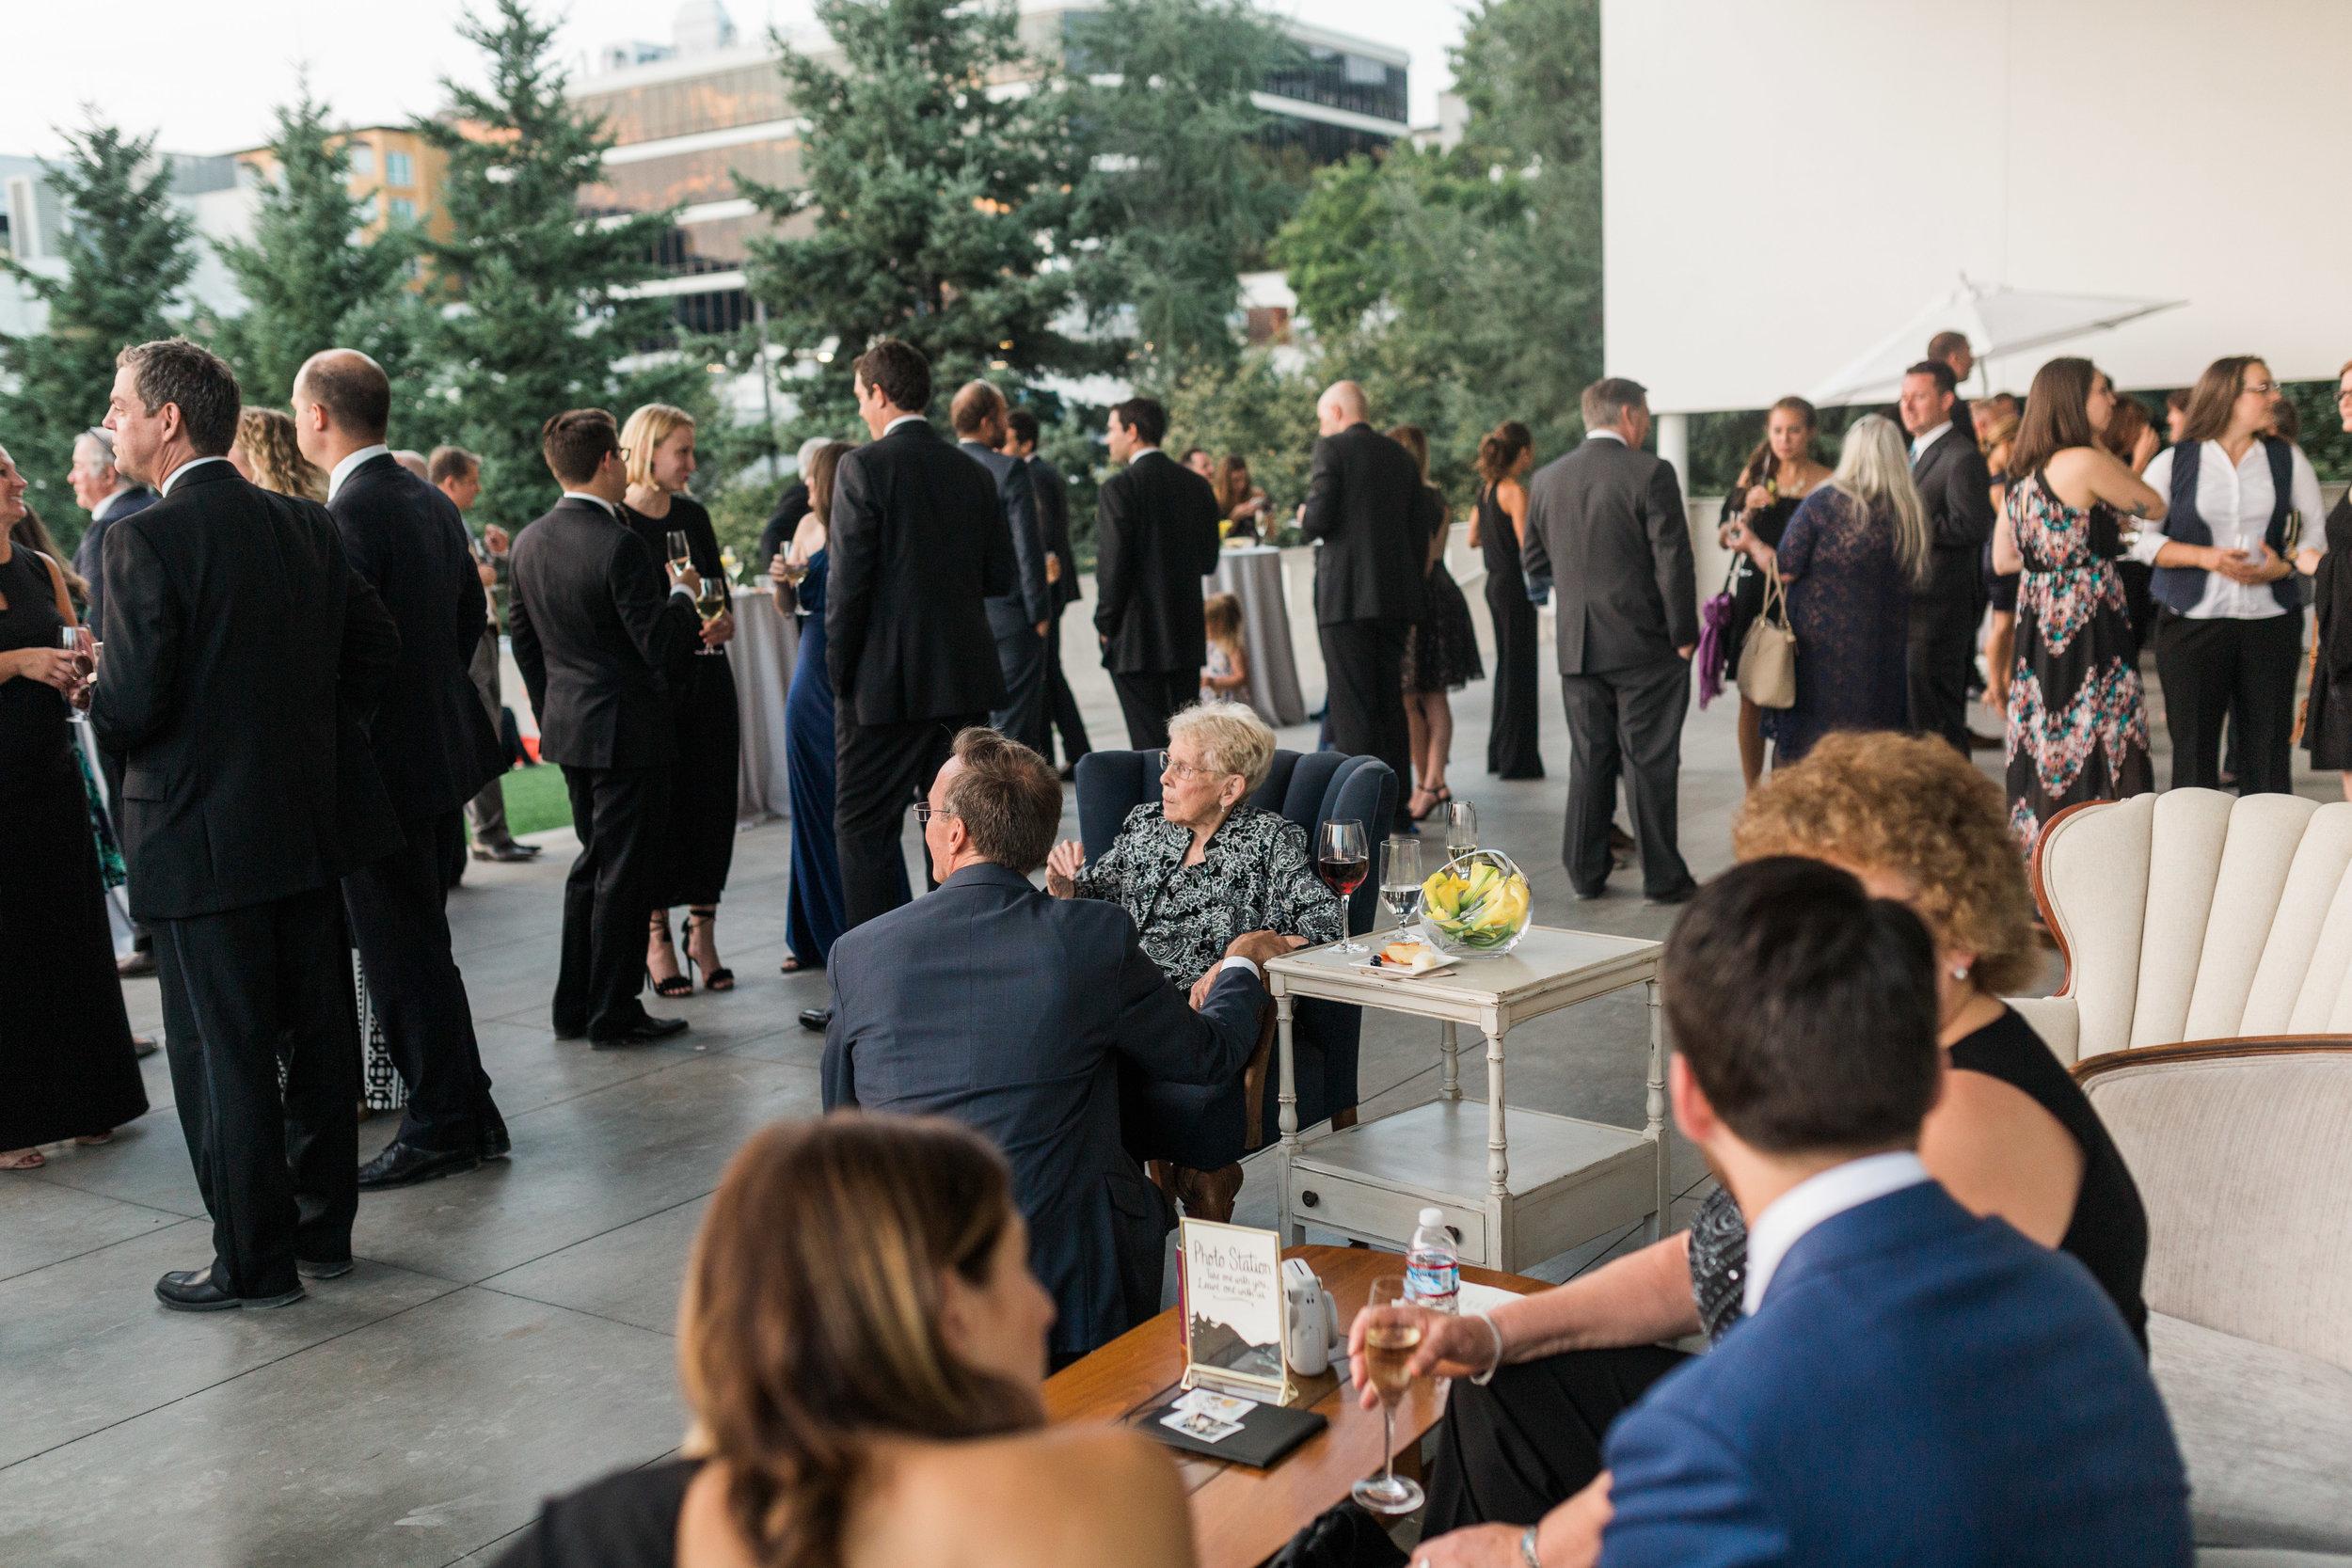 seattle-wedding-reception-party-northwest-outdoors